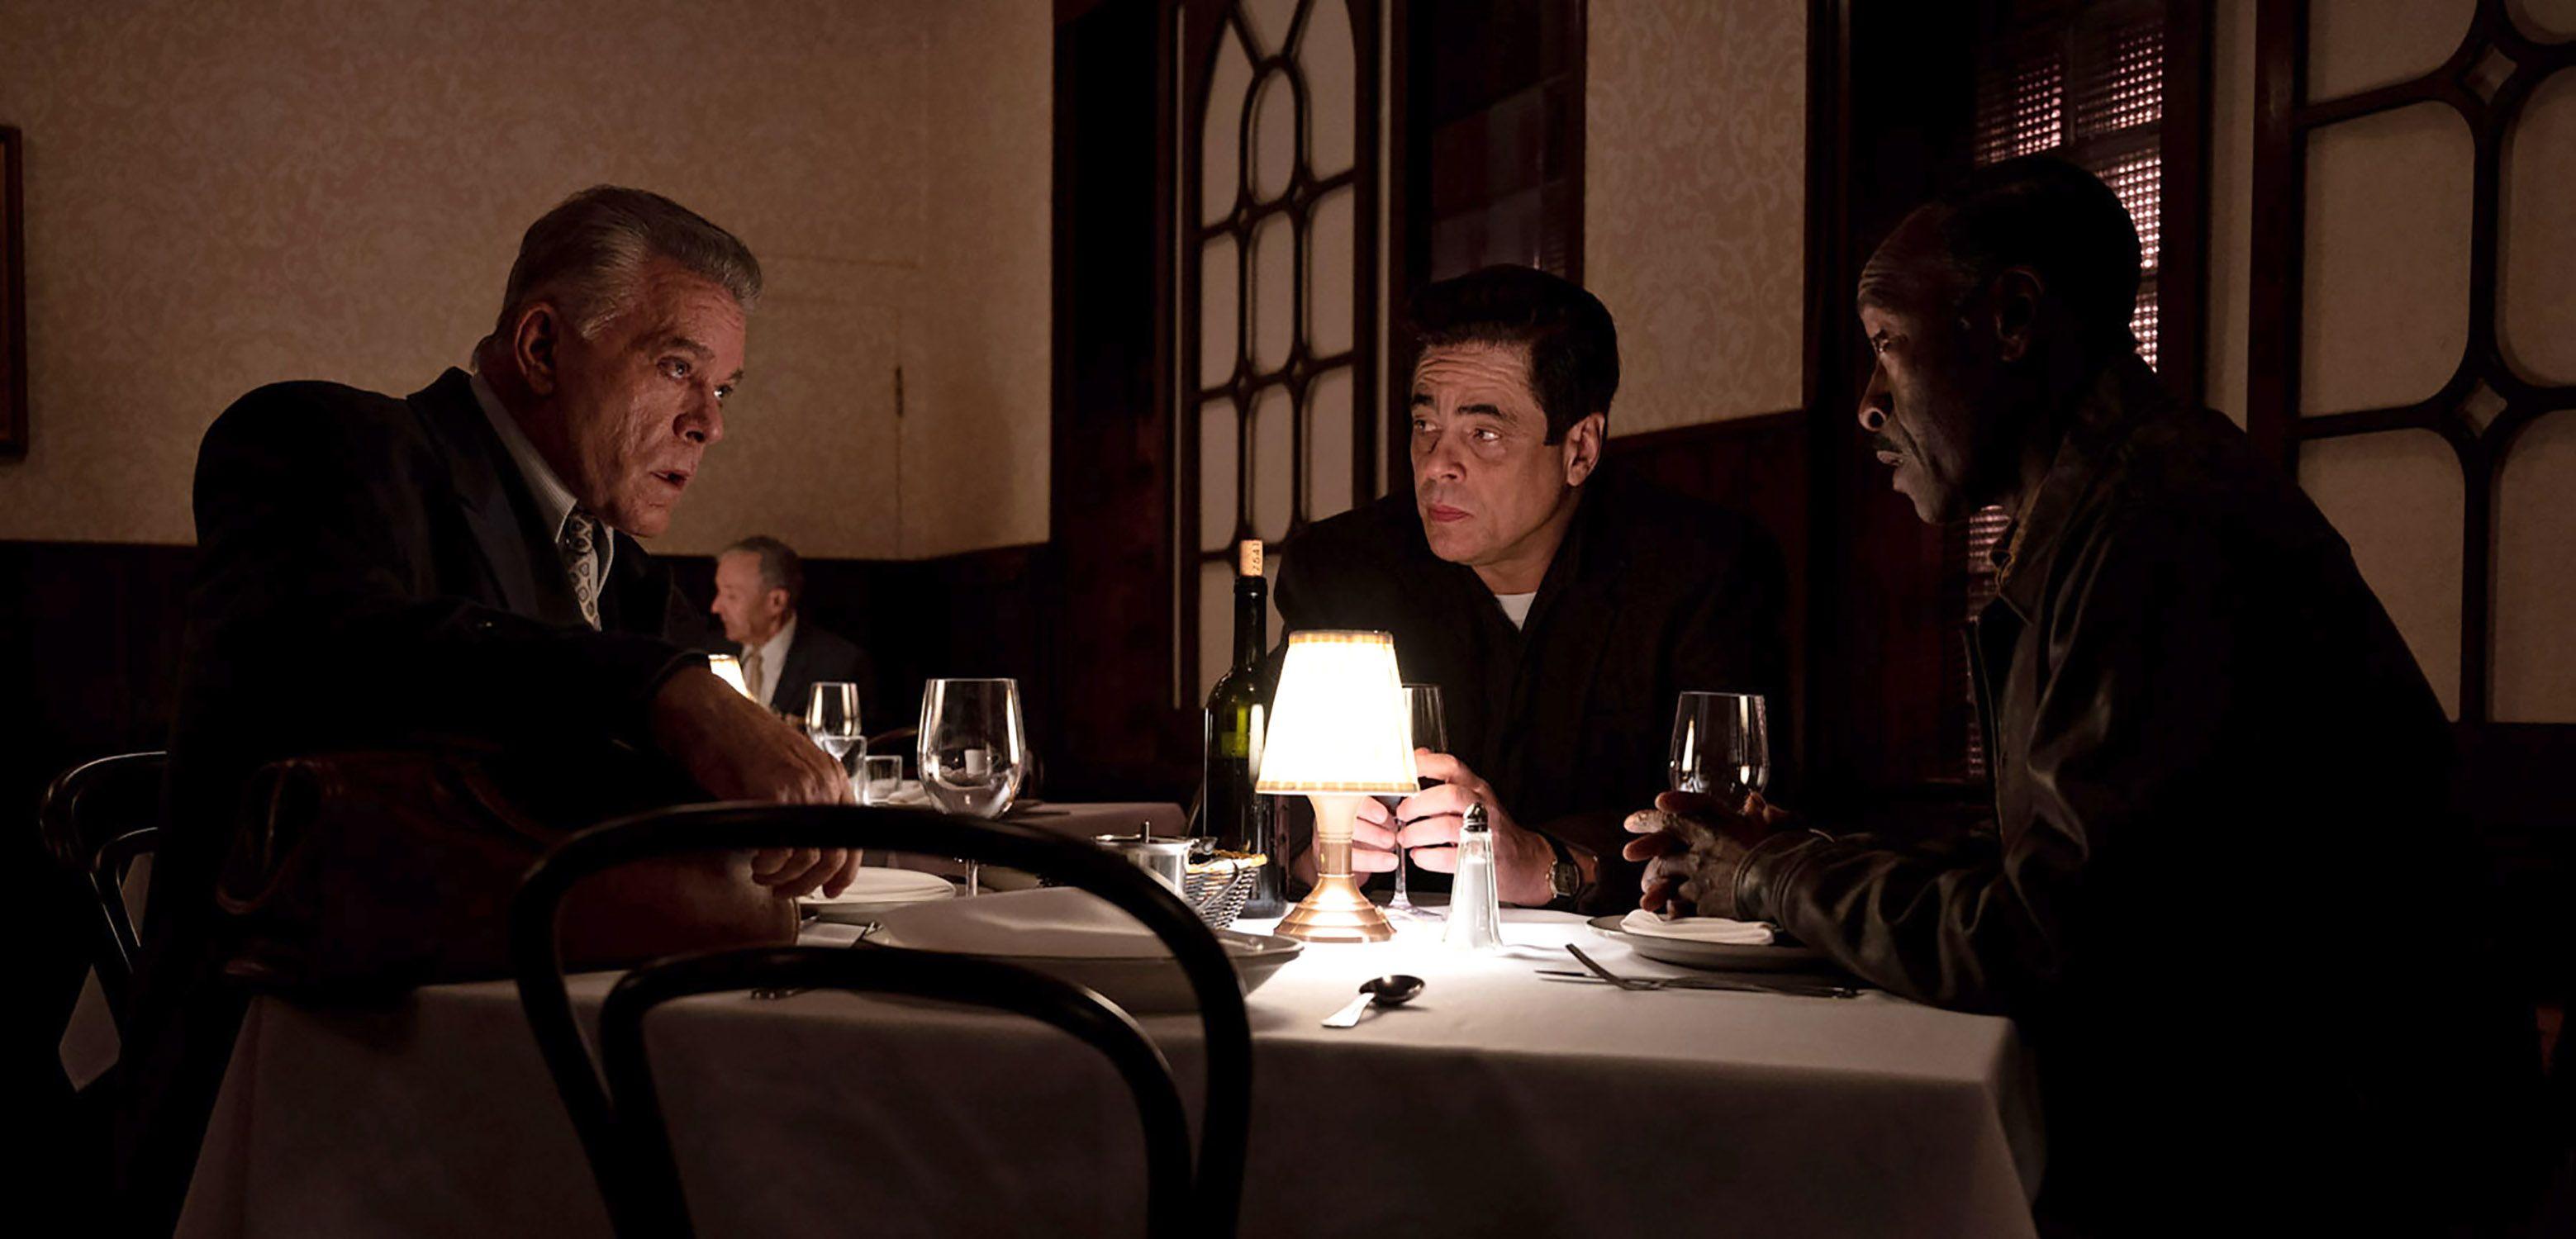 No Sudden Move Trailer Reveals Steven Soderbergh's Crime Thriller for HBO Max